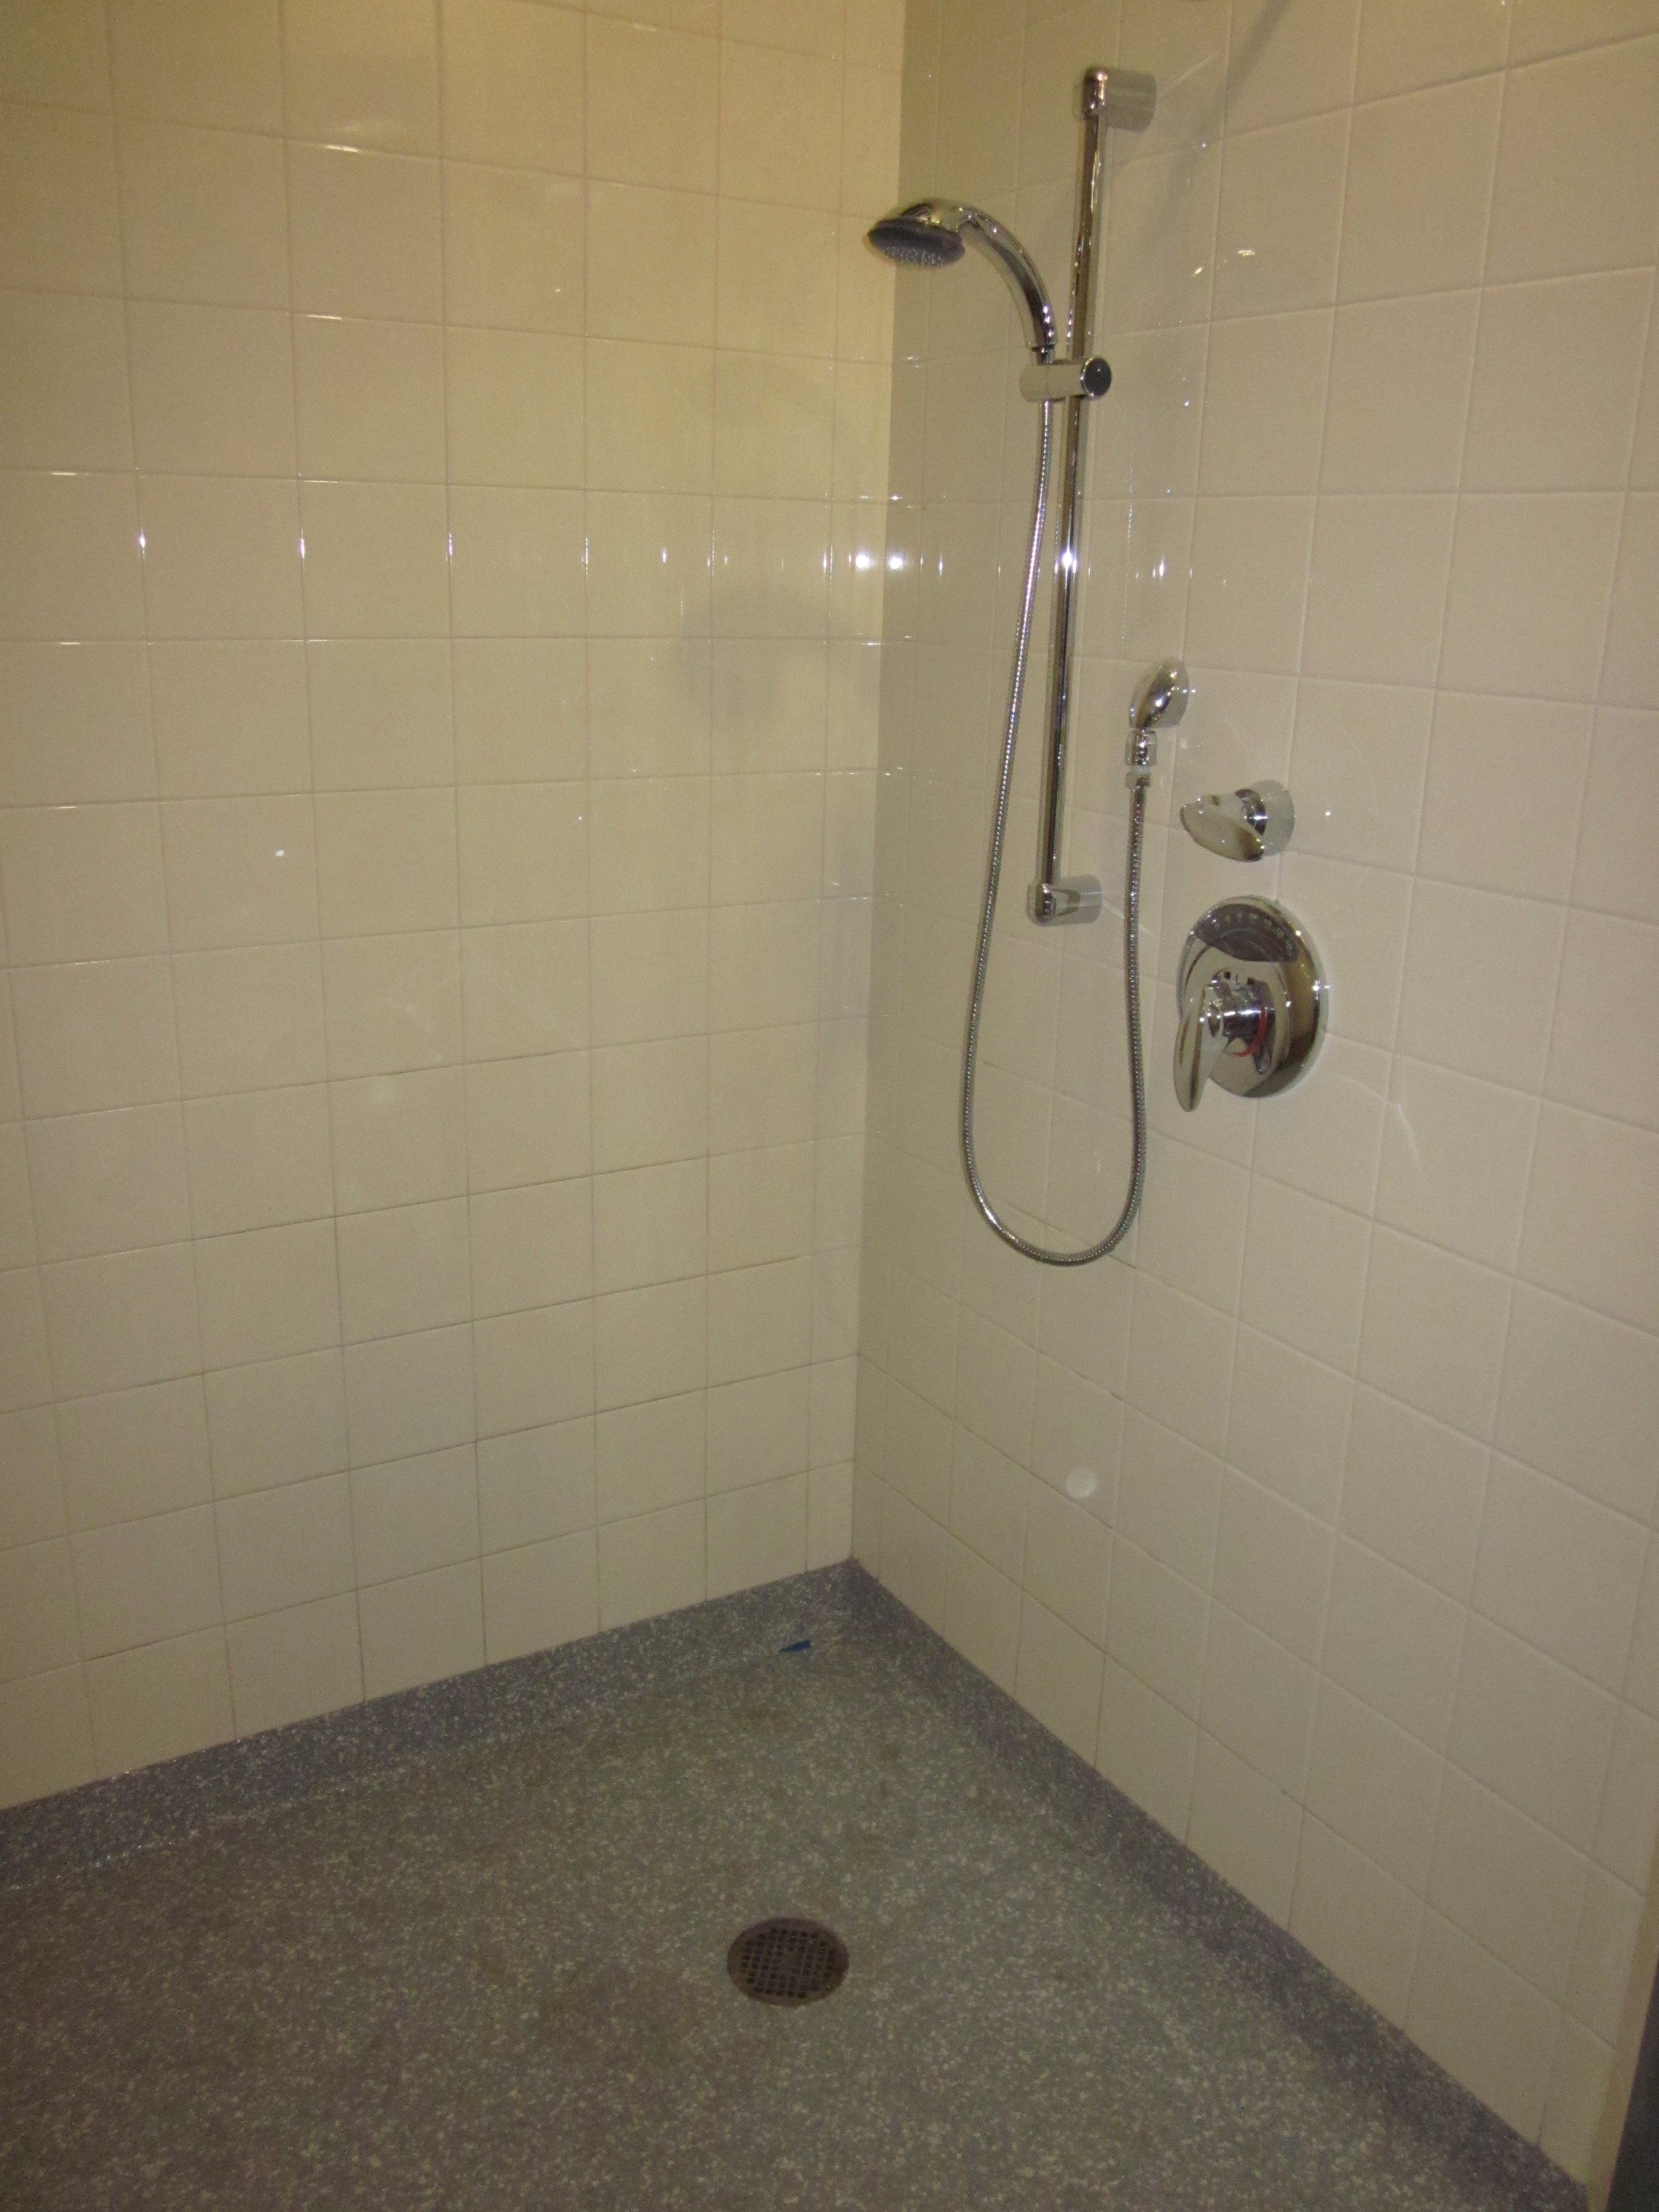 Epoxy Grout For Bathrooms: Epoxy, Health Alliance Hospital Bathroom, Leominster, MA